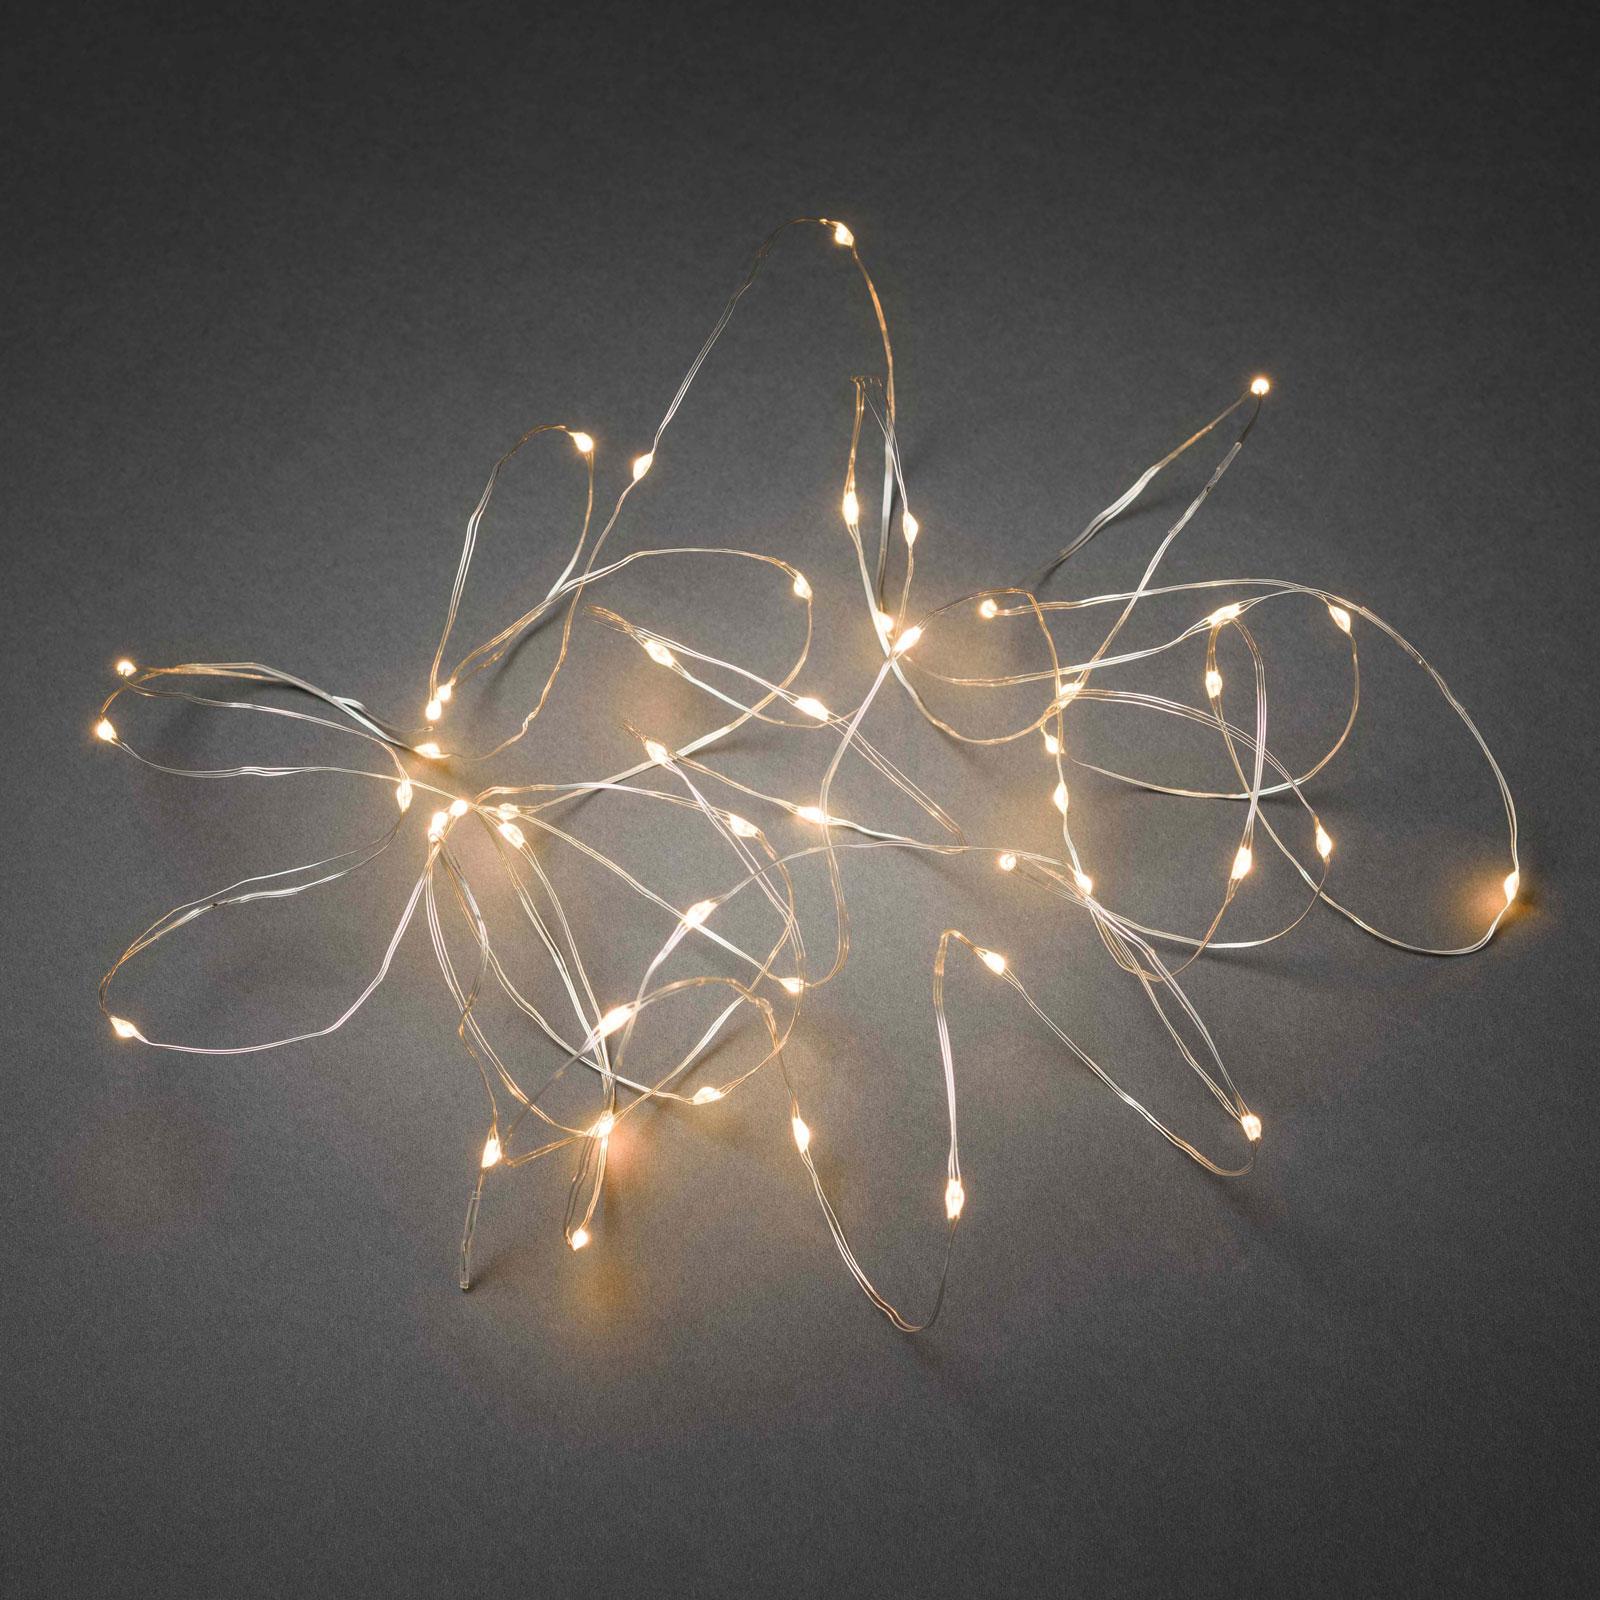 LED-ljusslinga droppar, app-styrd